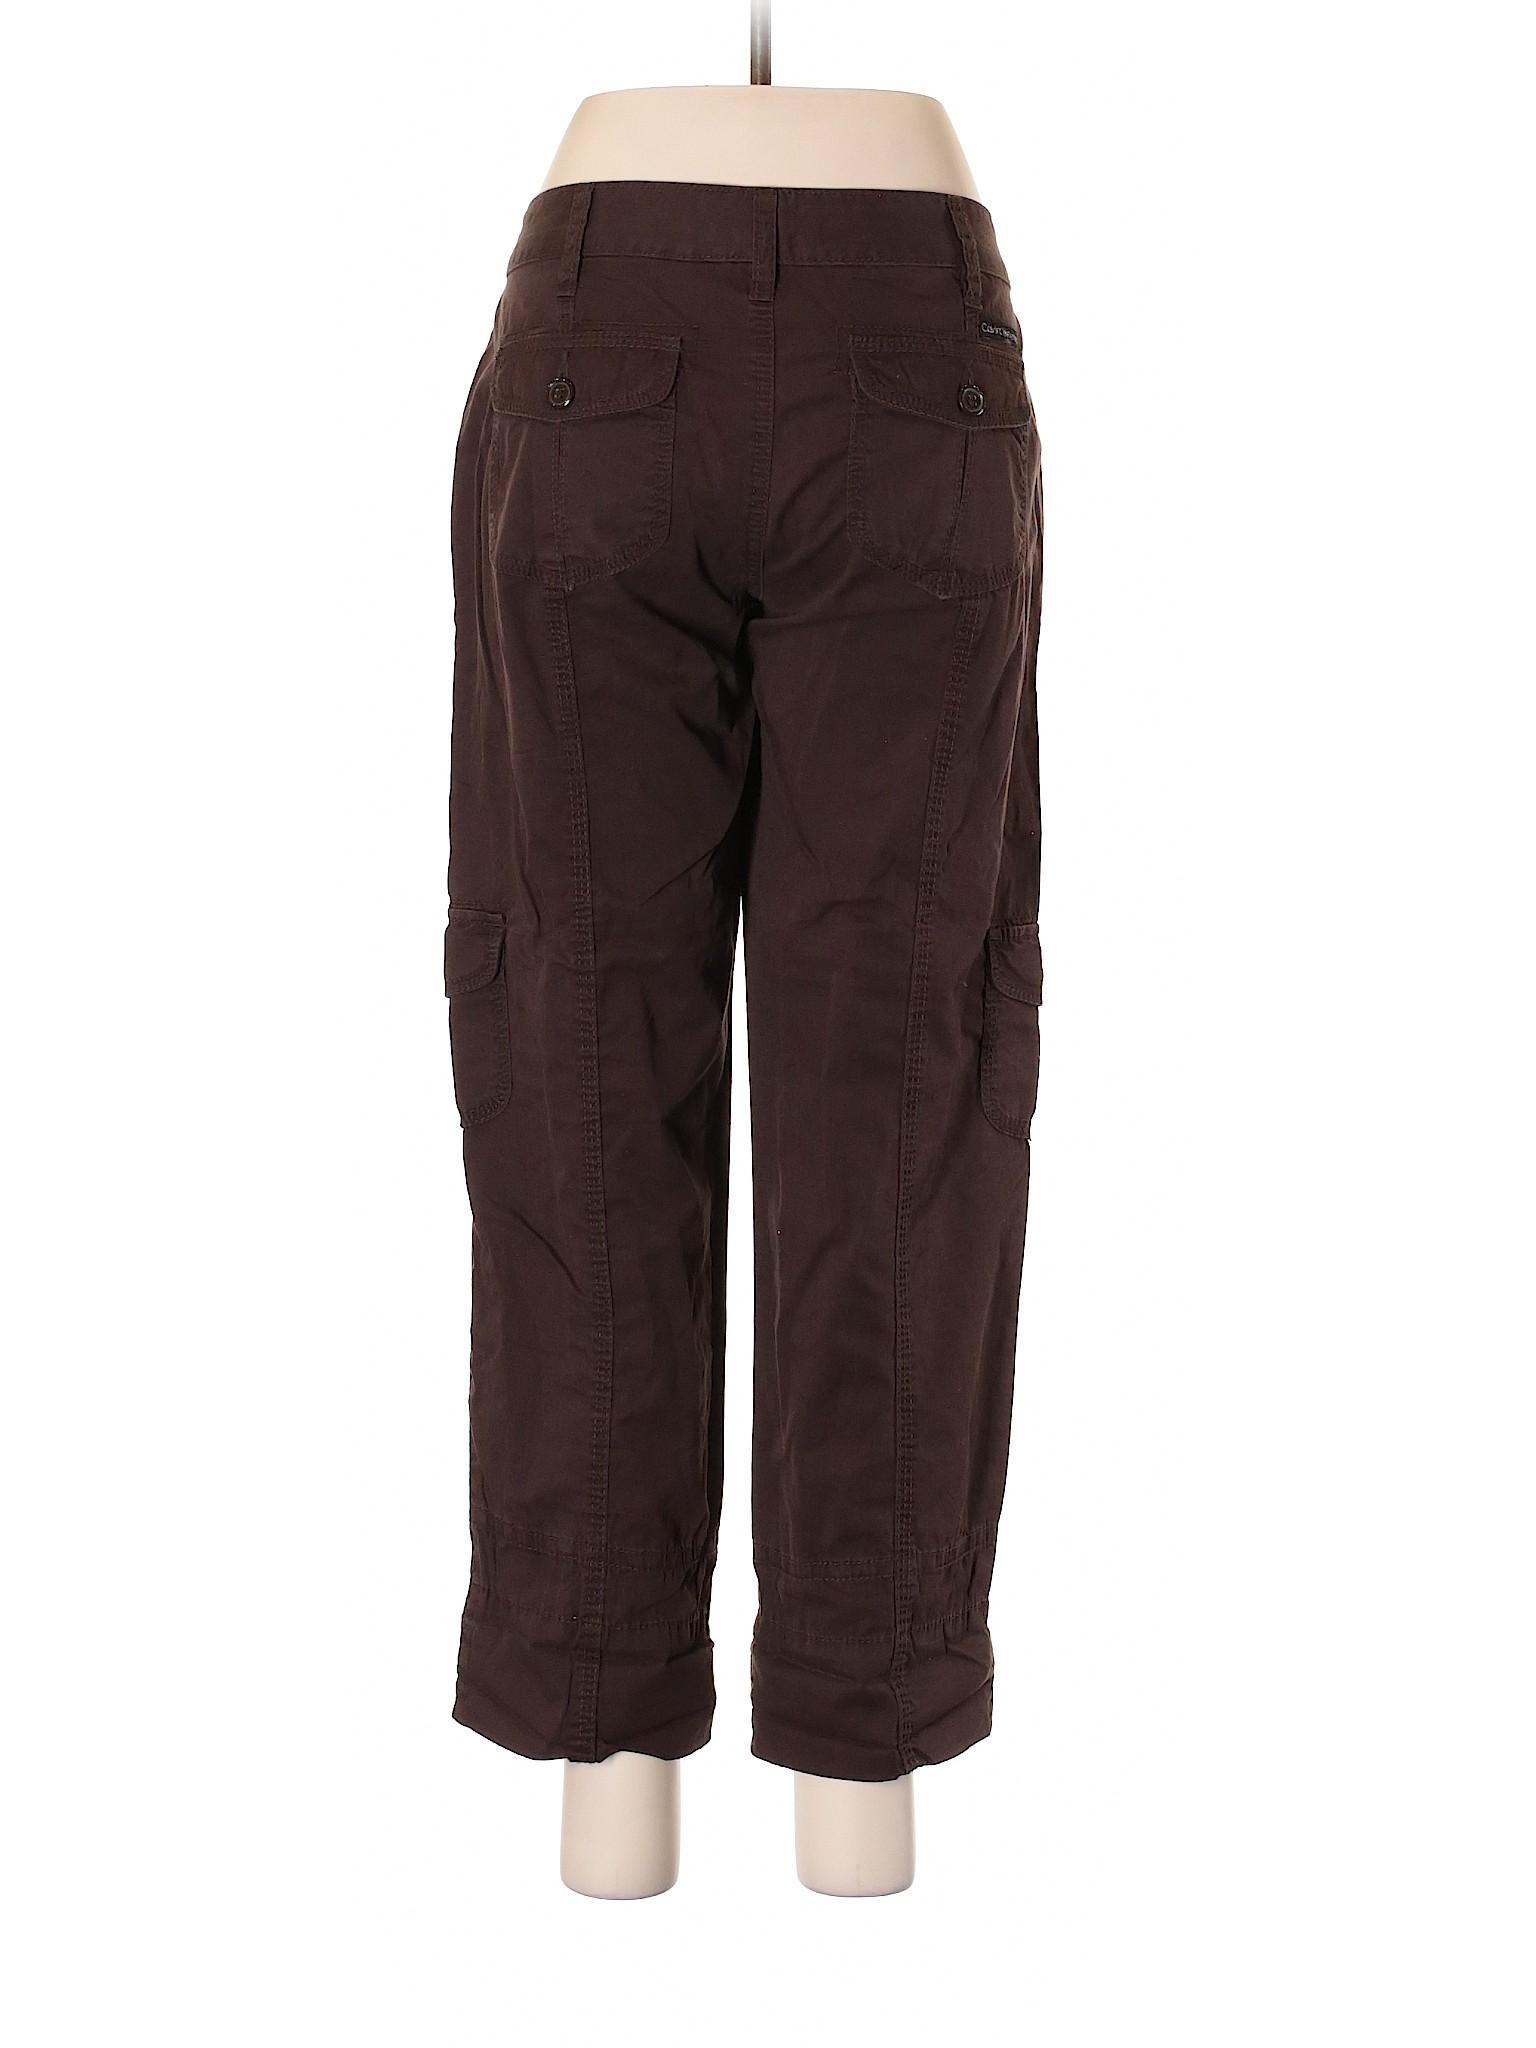 JEANS Boutique Pants leisure Cargo CALVIN KLEIN SwHtx4Uw1q